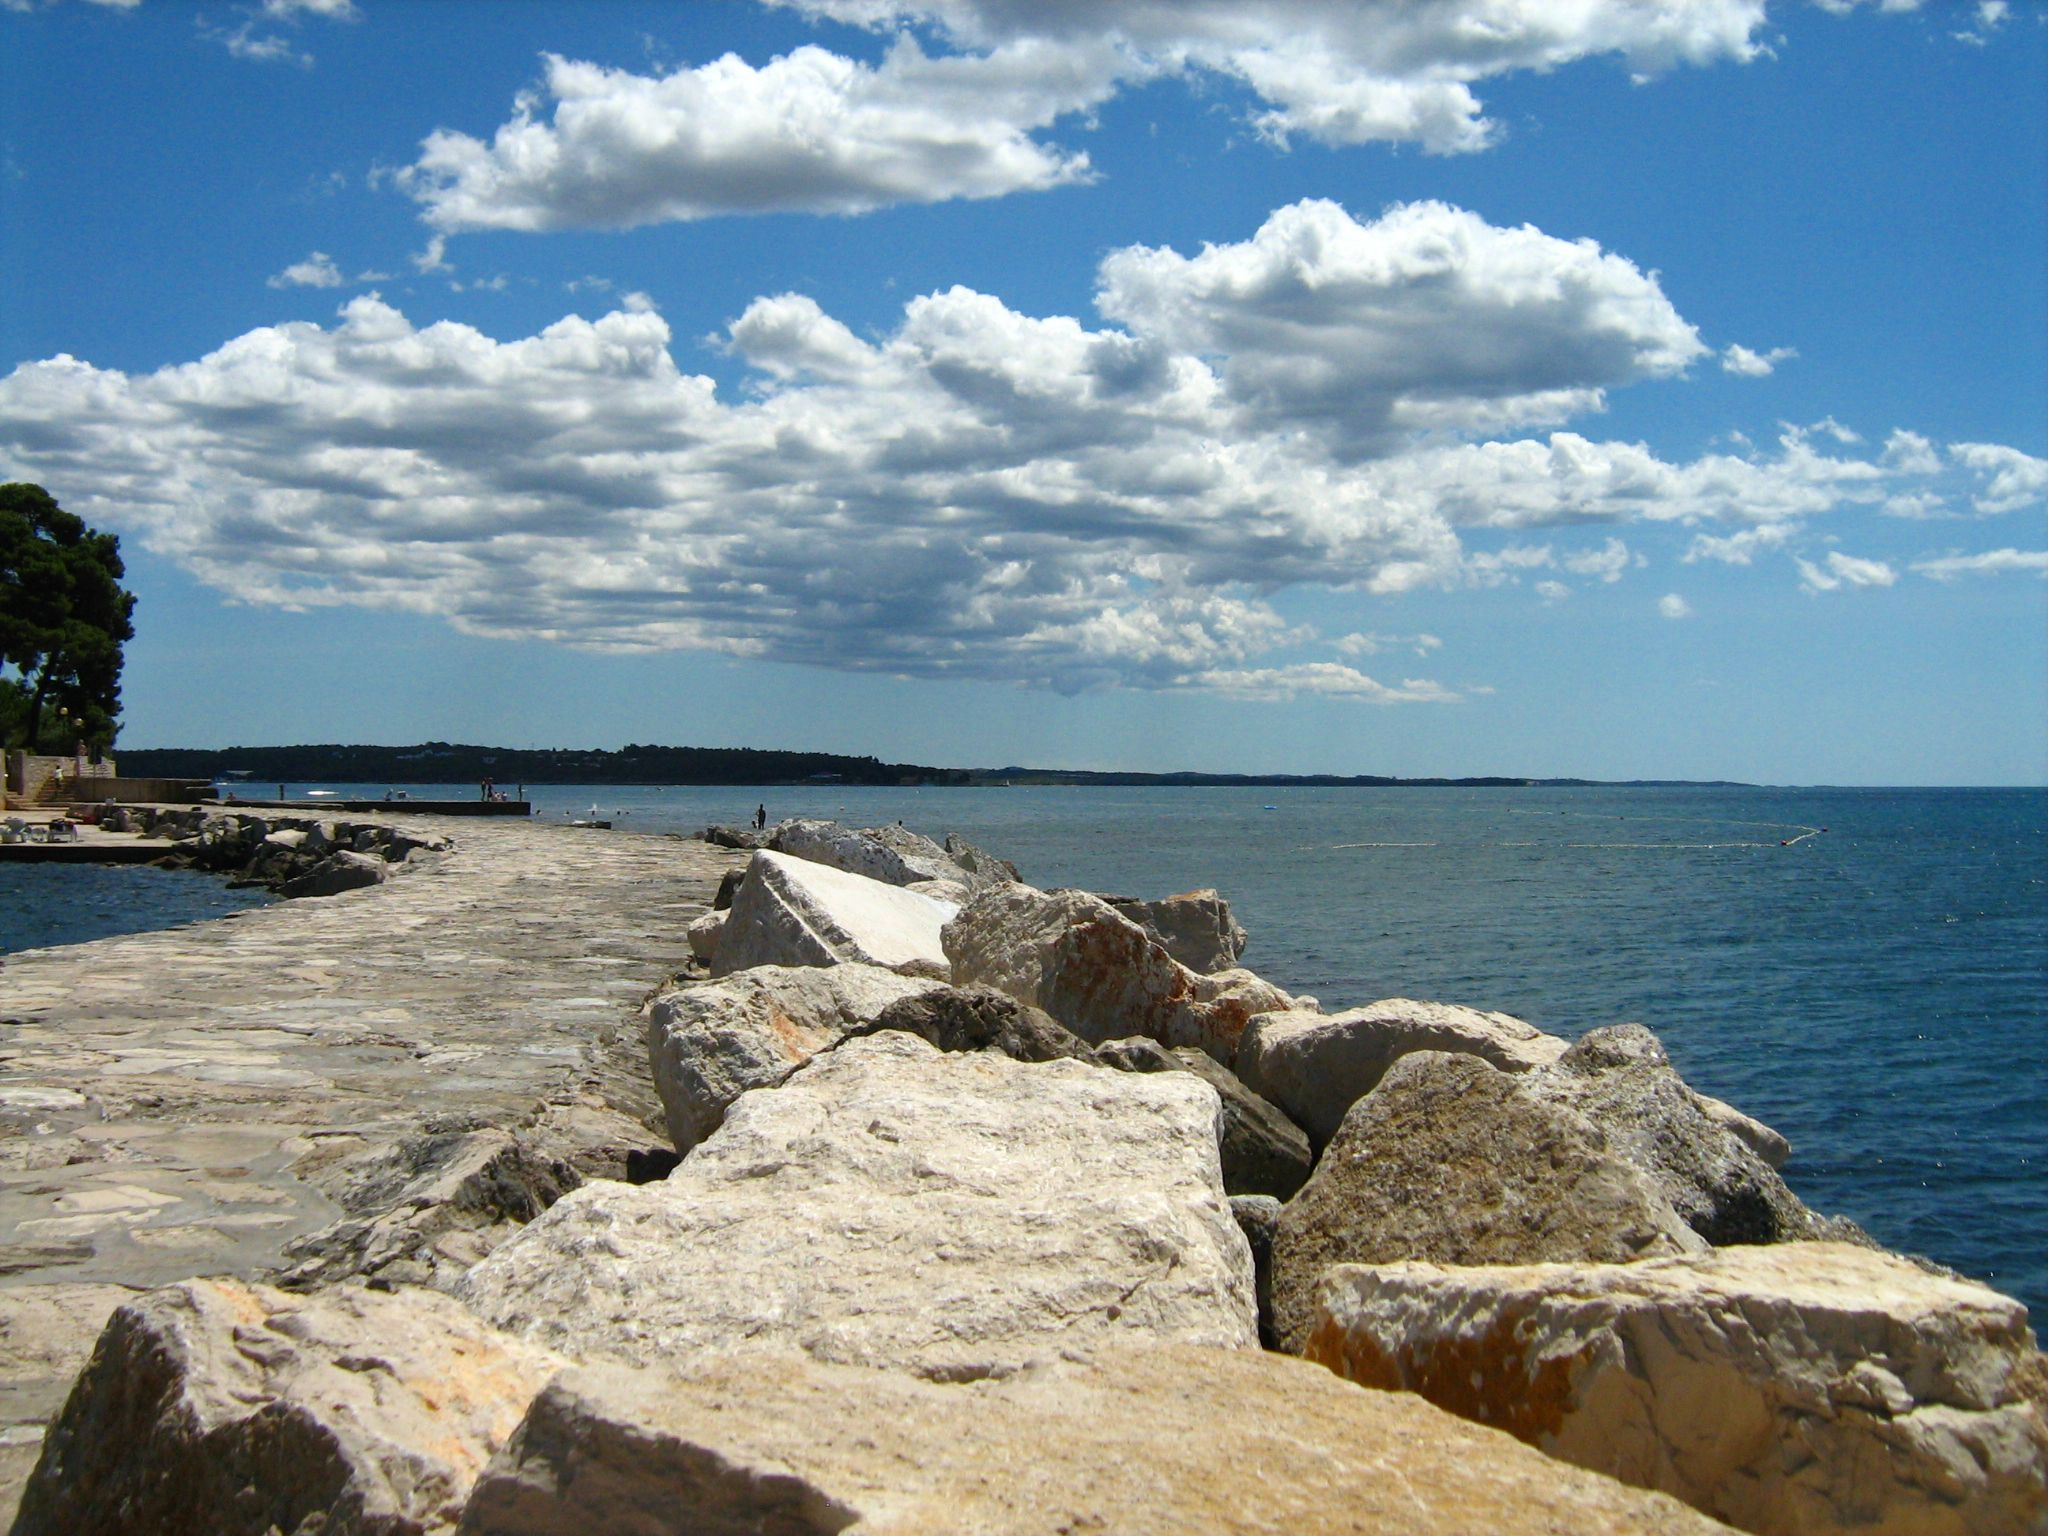 Novigrad Cittanova Istria Outdoor Istra Beach